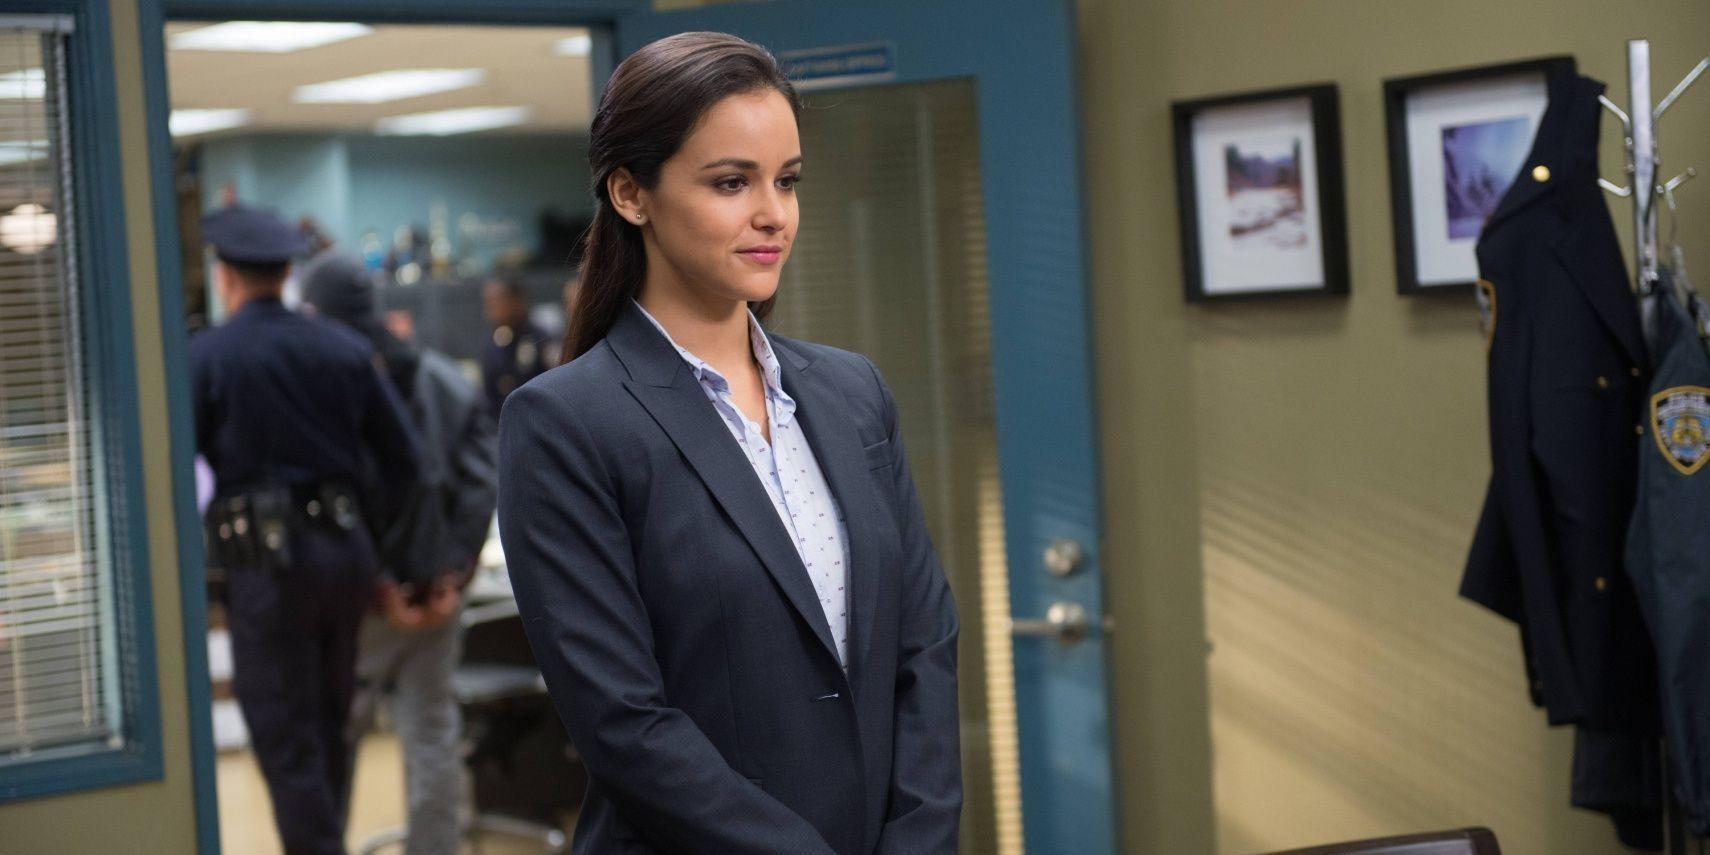 Brooklyn Nine-Nine Will Have A Satisfying Ending Promises Melissa Fumero